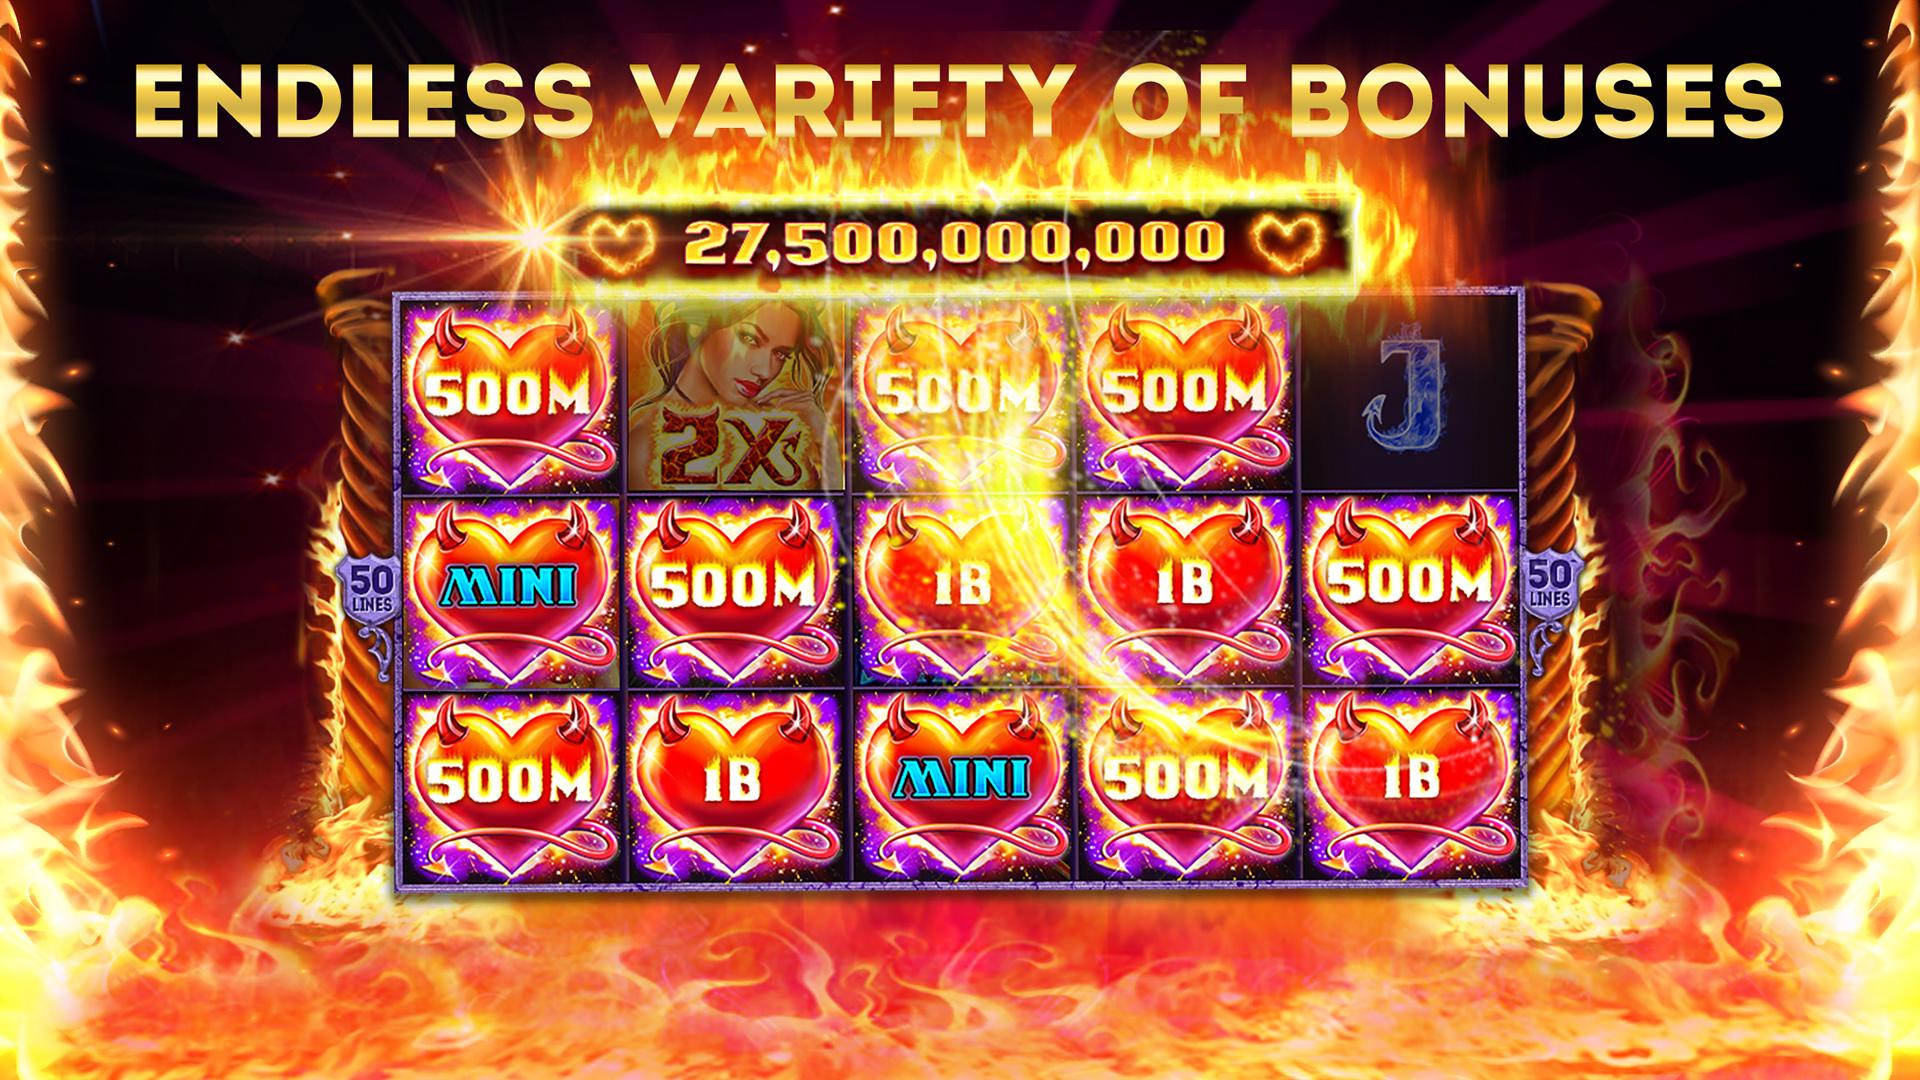 Luxus casino lobby demo betgoldstar